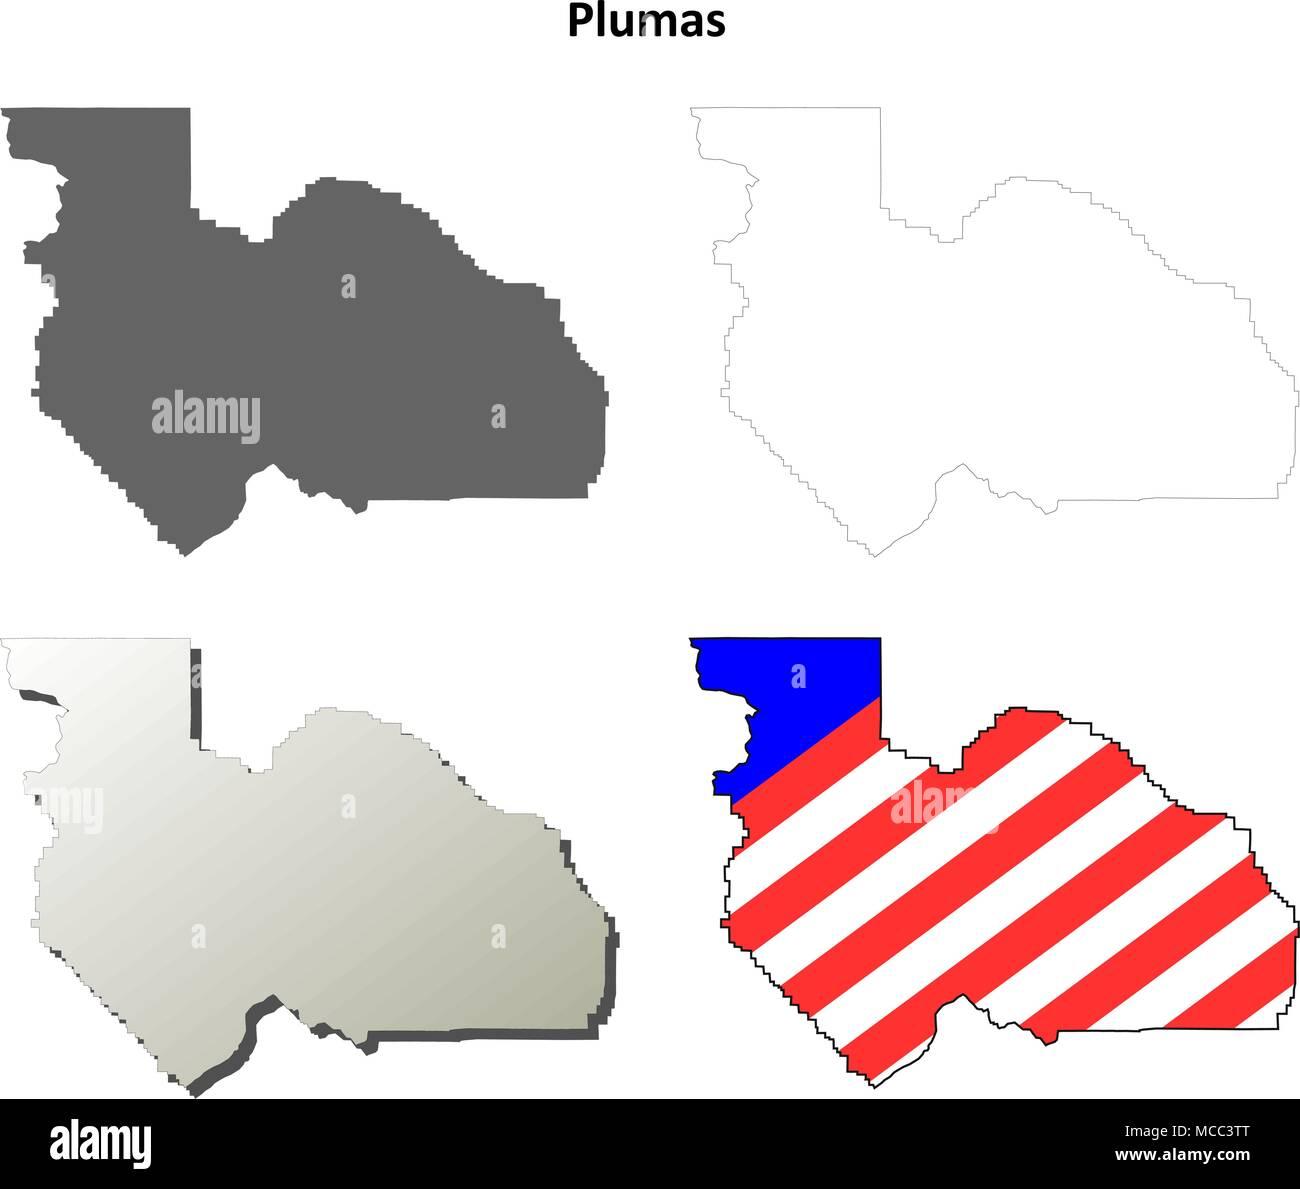 Plumas County California Outline Map Set